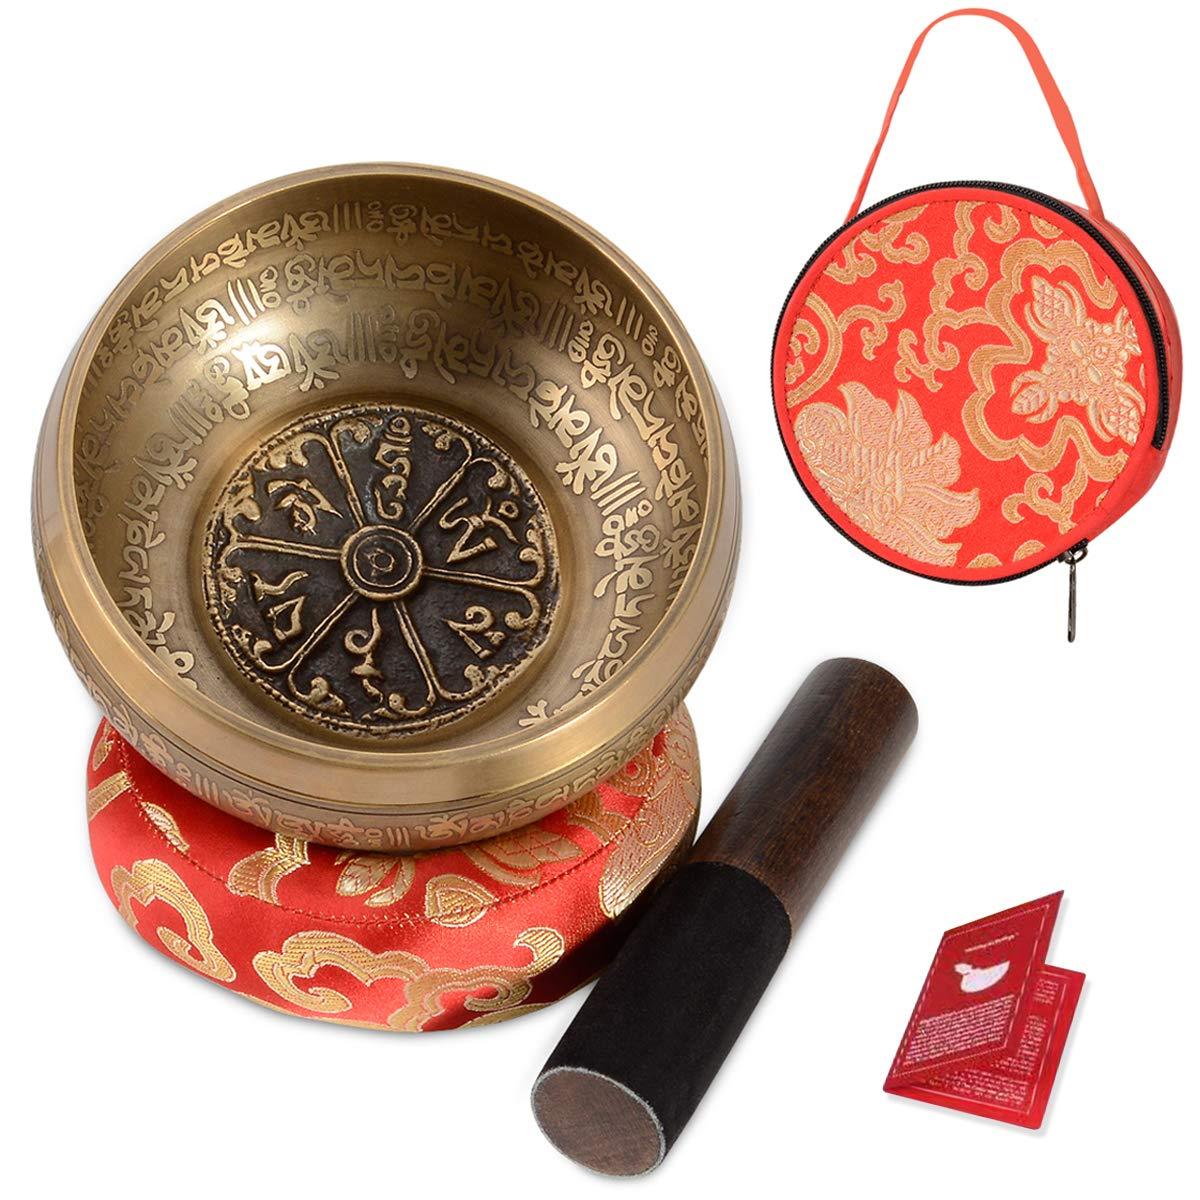 SHANSHUI Singing Bowl, 5 inch Meditation Tibetan Set, Nepal Antique Mantra Carving Hand Hammered, Sound For Yoga Chakras Healing Meditation -Red by SHANSHUI